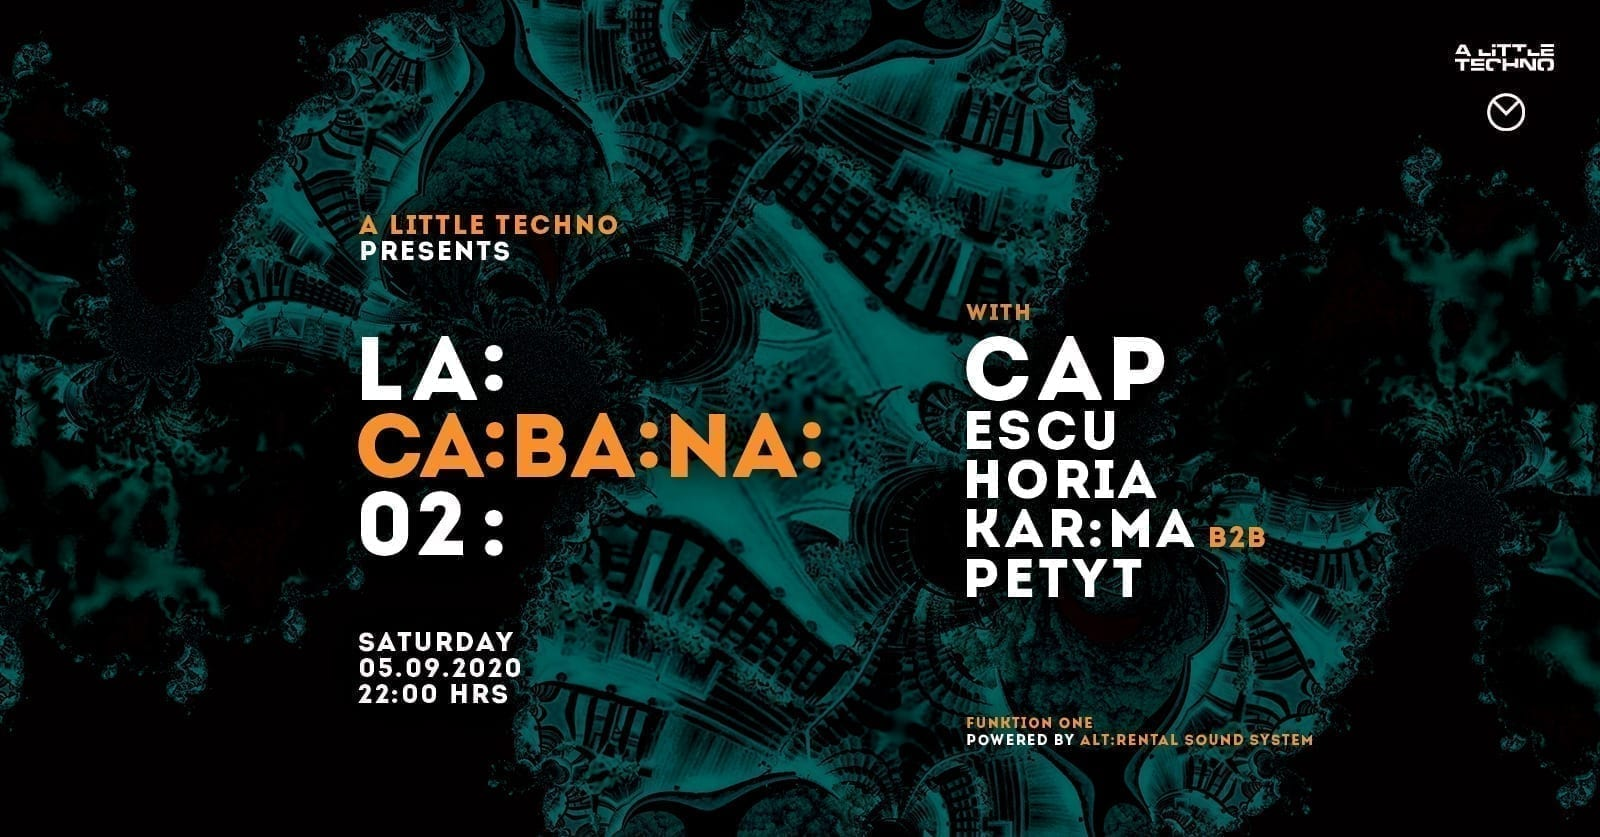 LA:CA:BA:NA 02. with Cap, Escu, Horia, Kar:ma b2b Pety